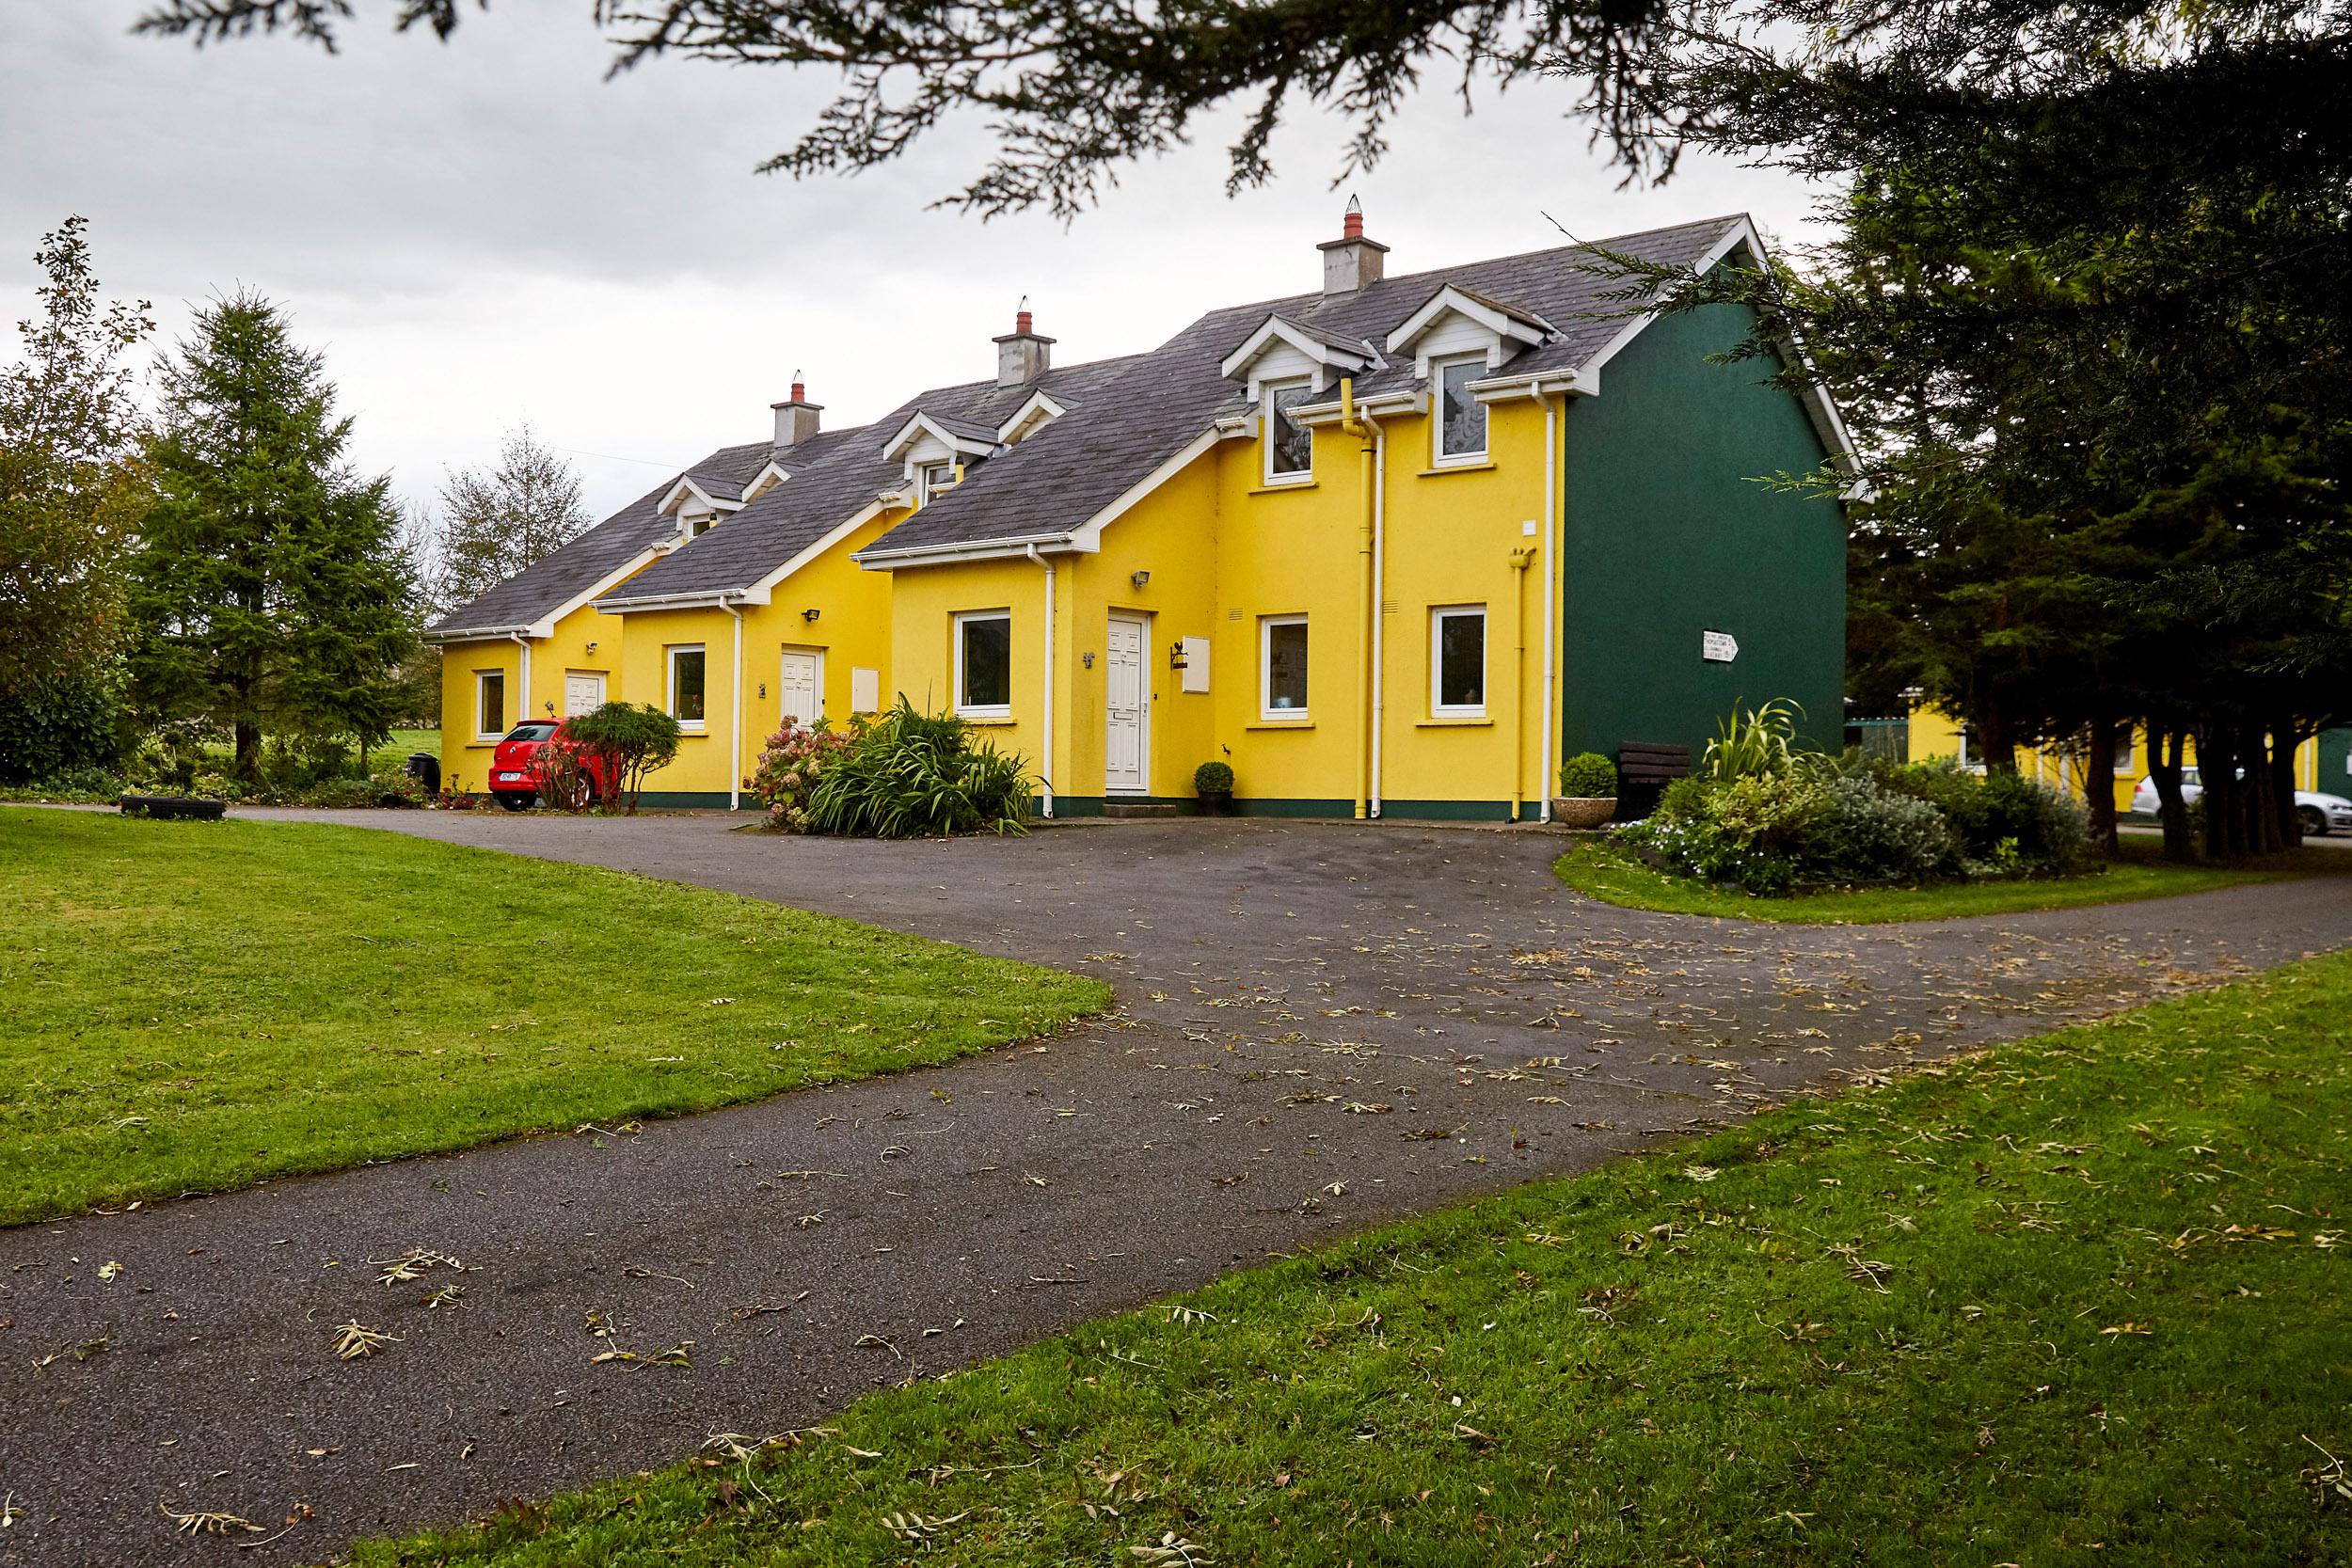 Mount Brandon Cottage 1, County Kilkenny